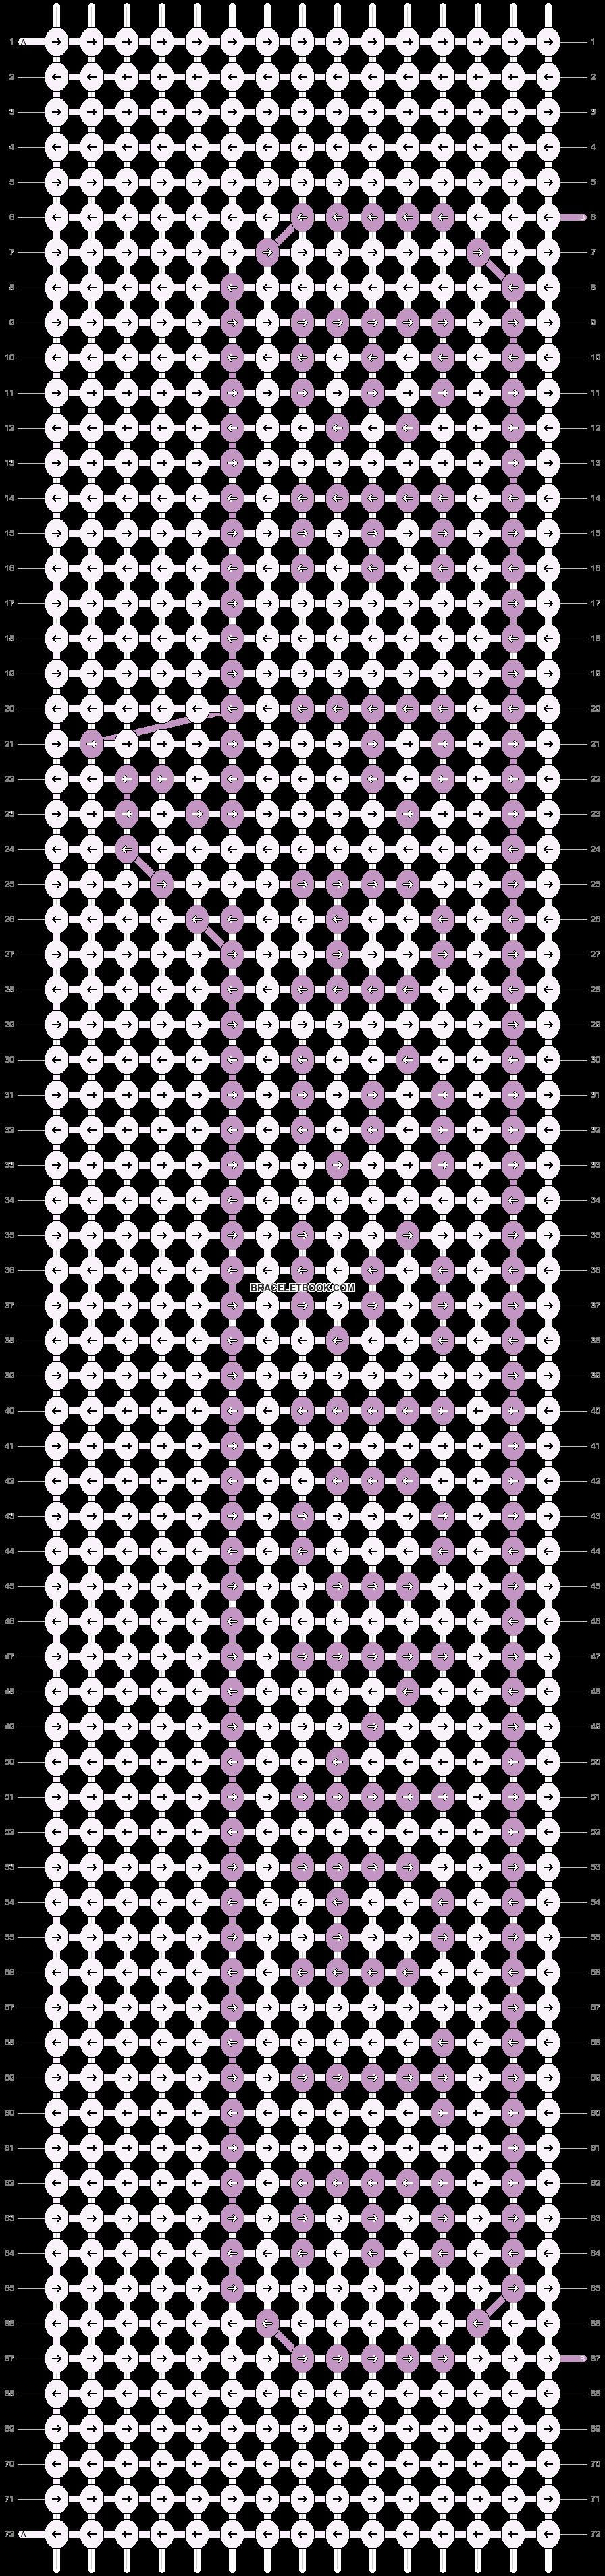 Alpha pattern #21184 pattern